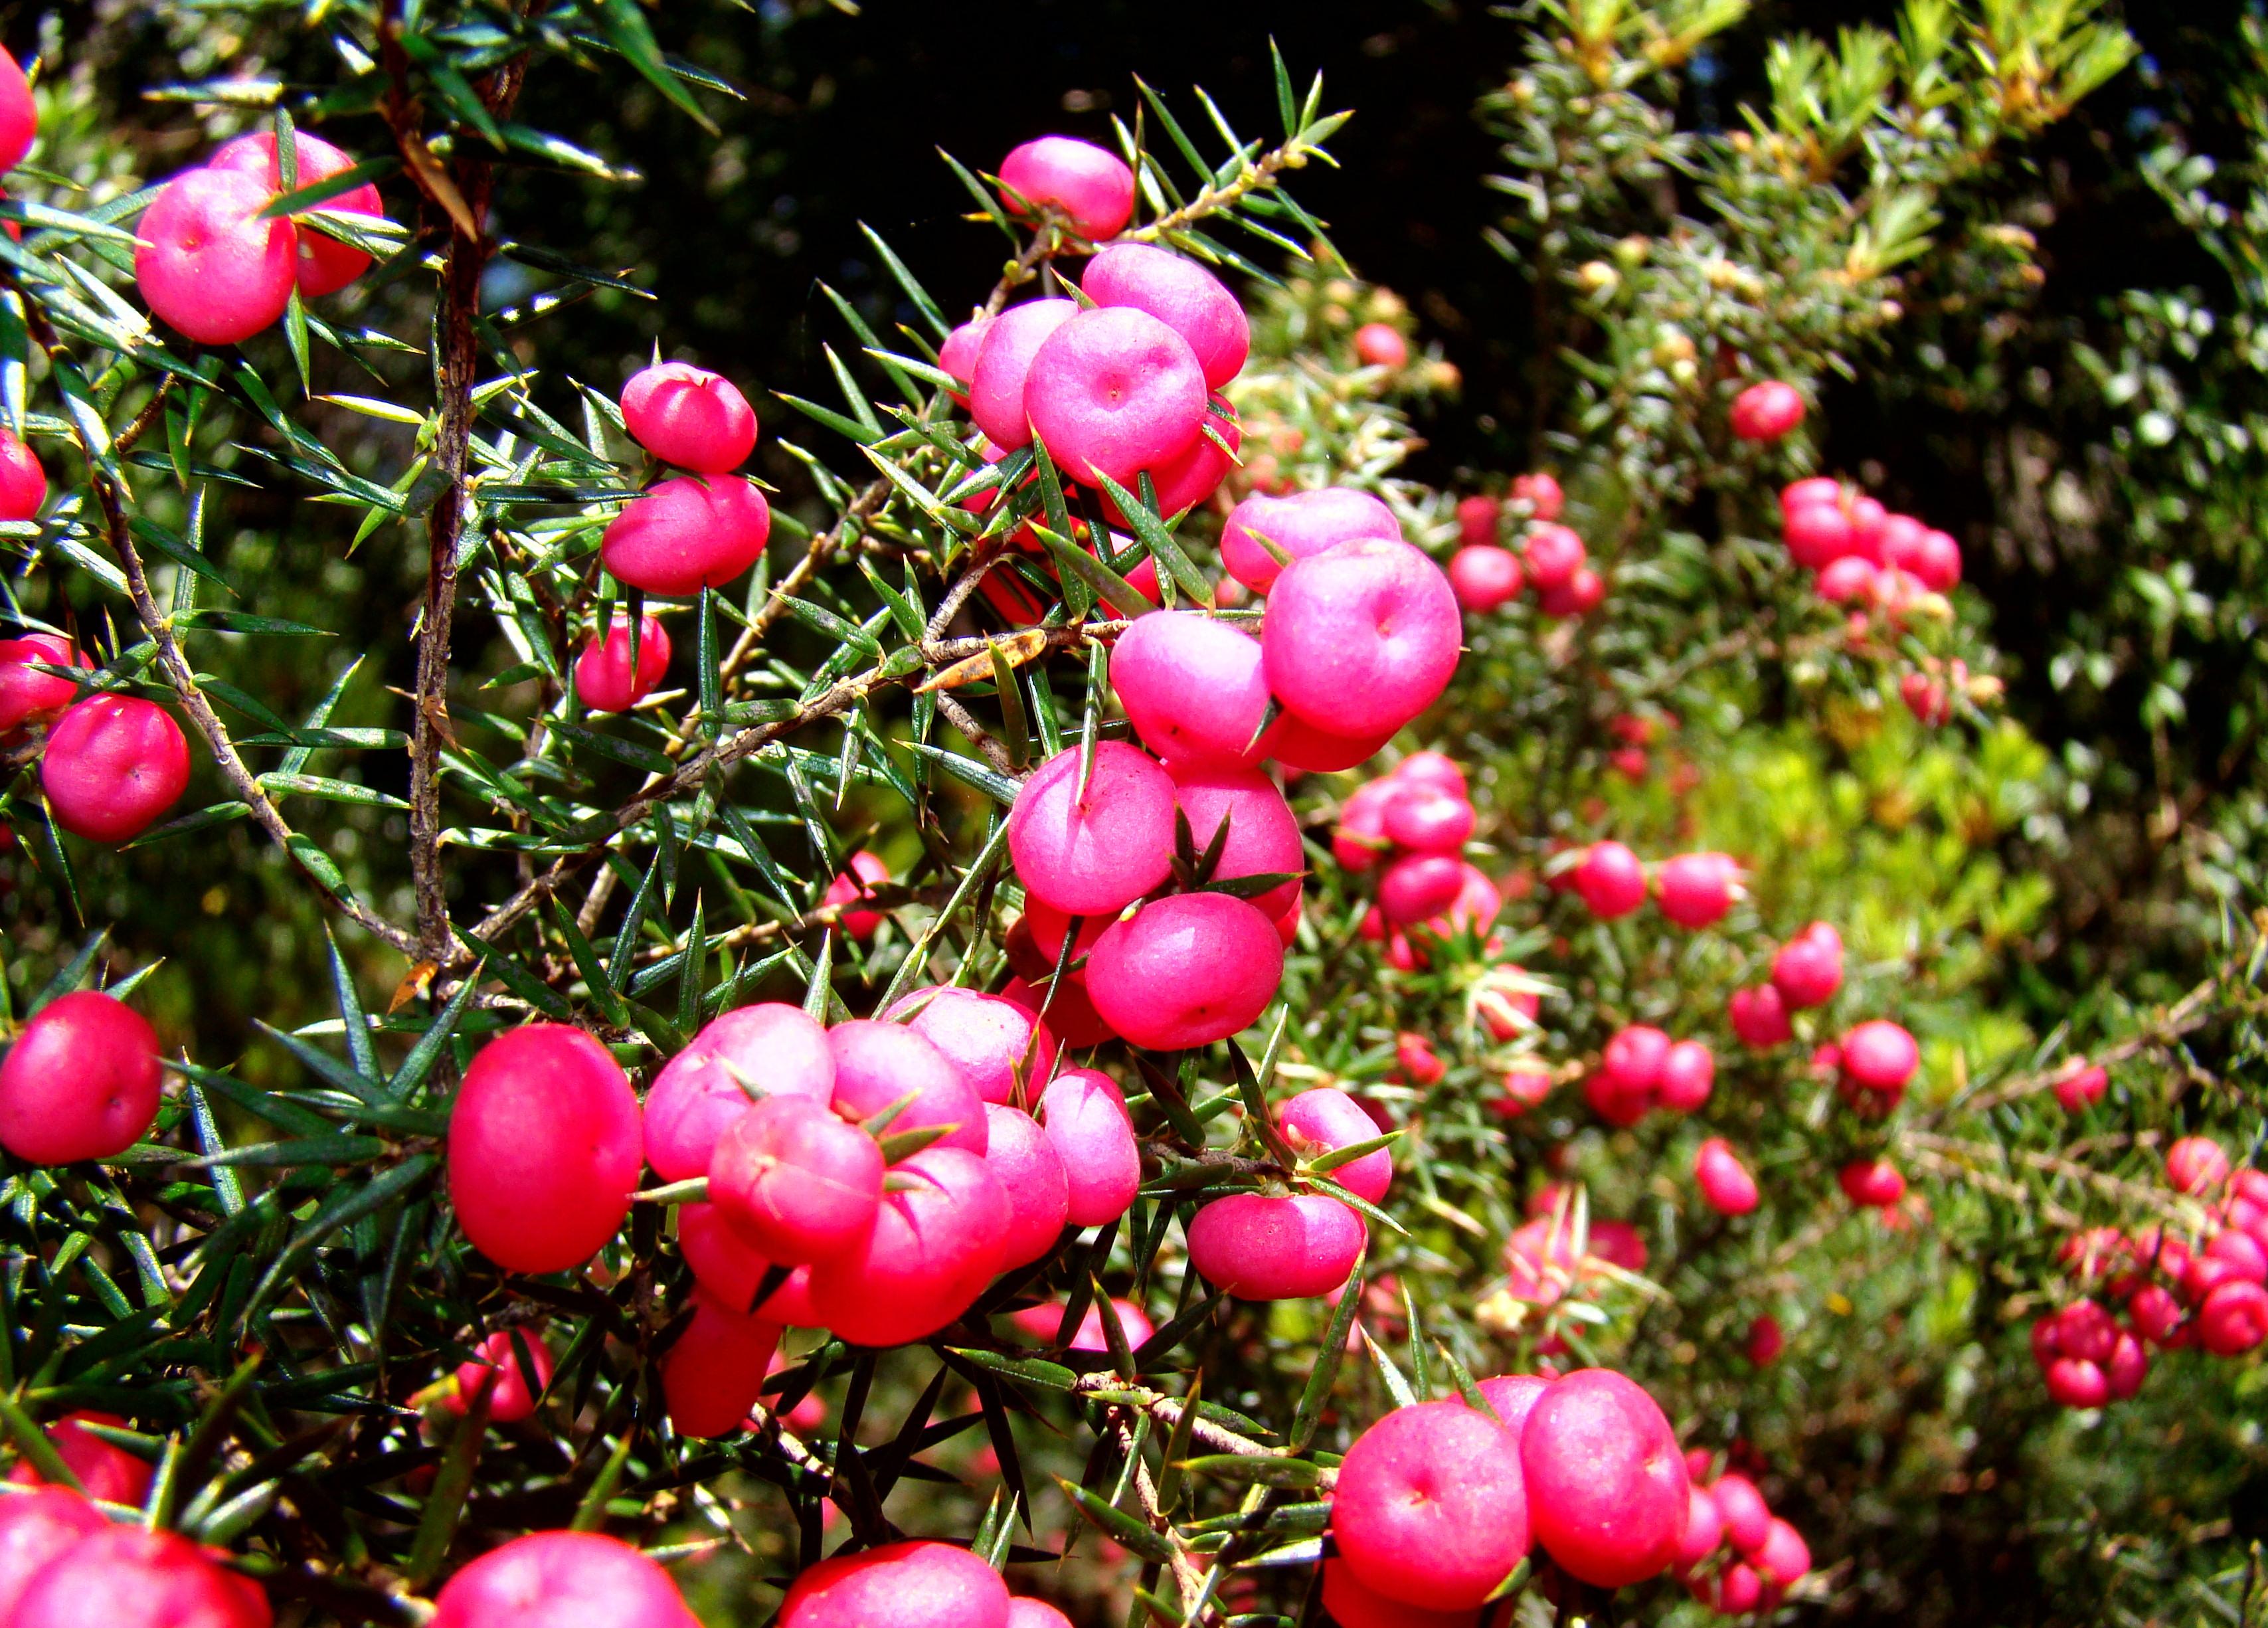 File:Pink Mountain Berries Lake St Clair.jpg - Wikimedia Commons